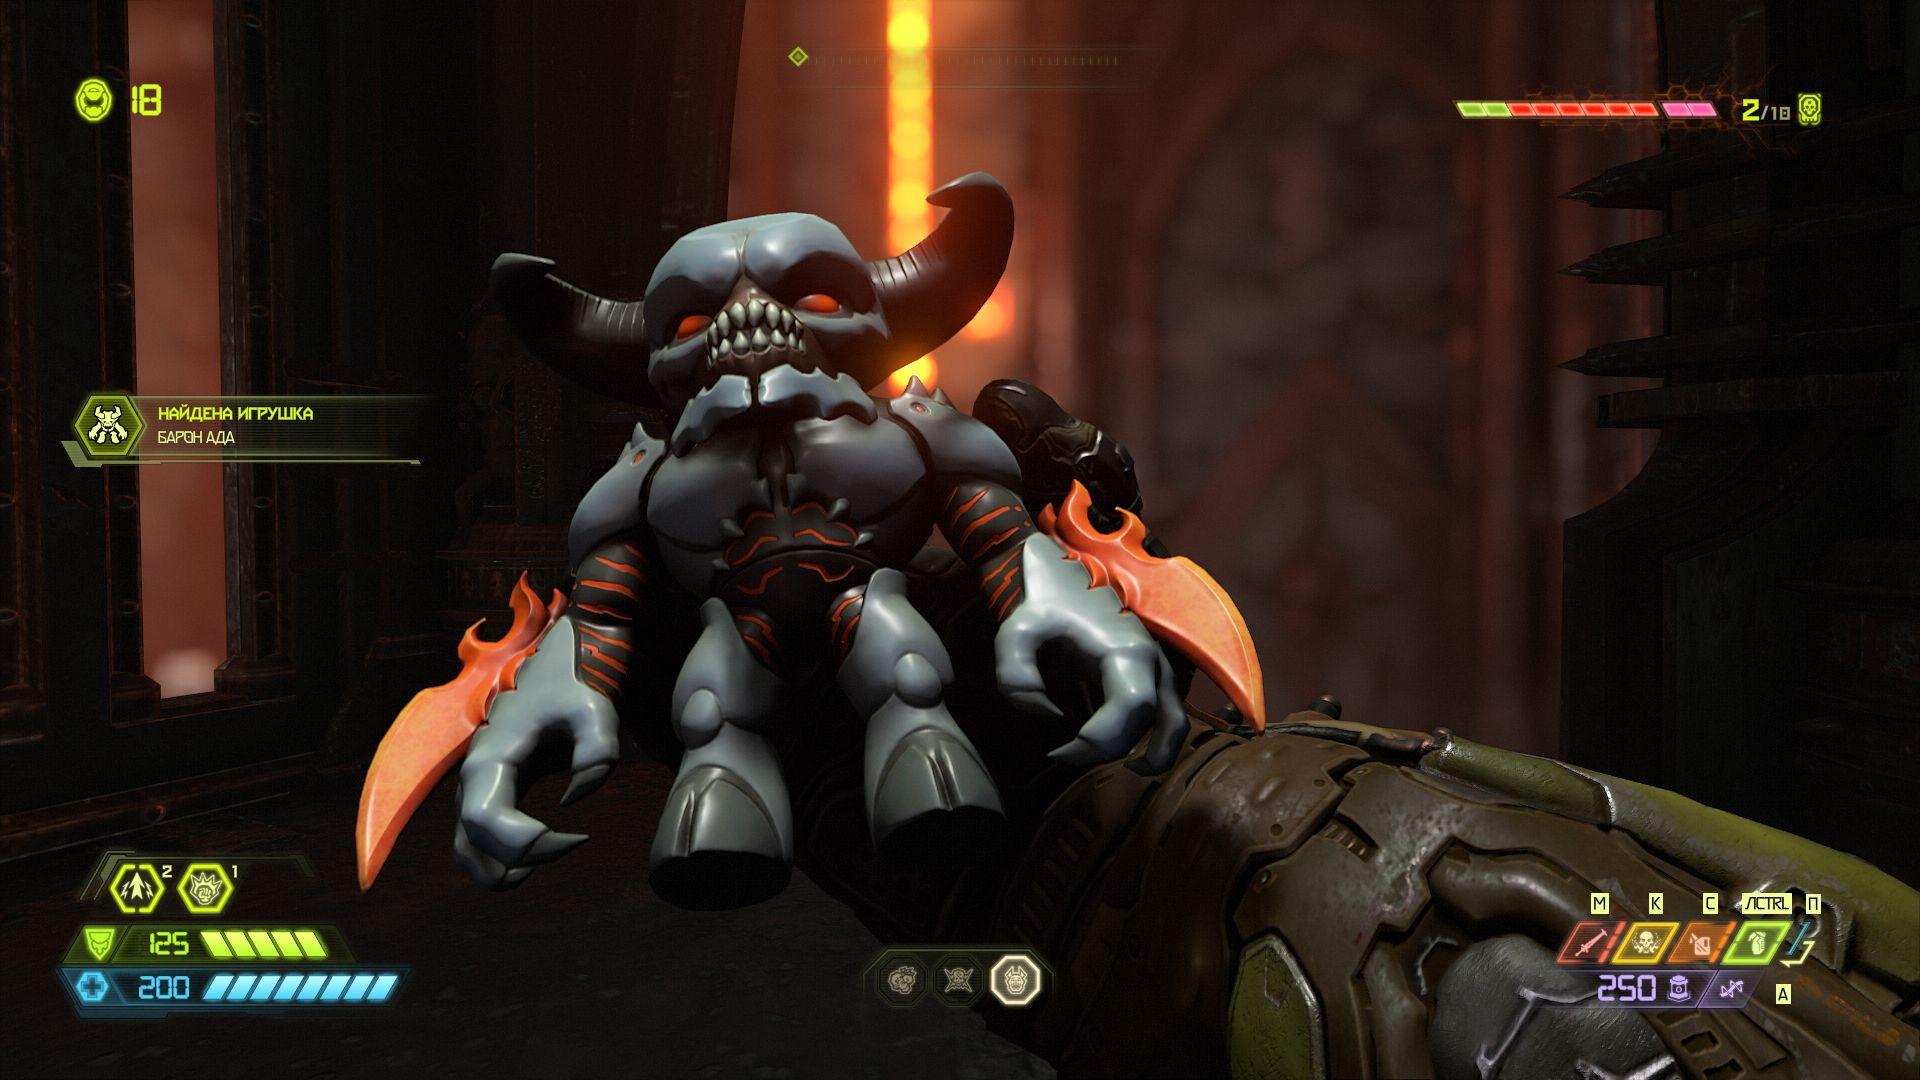 000155.Jpg - Doom Eternal